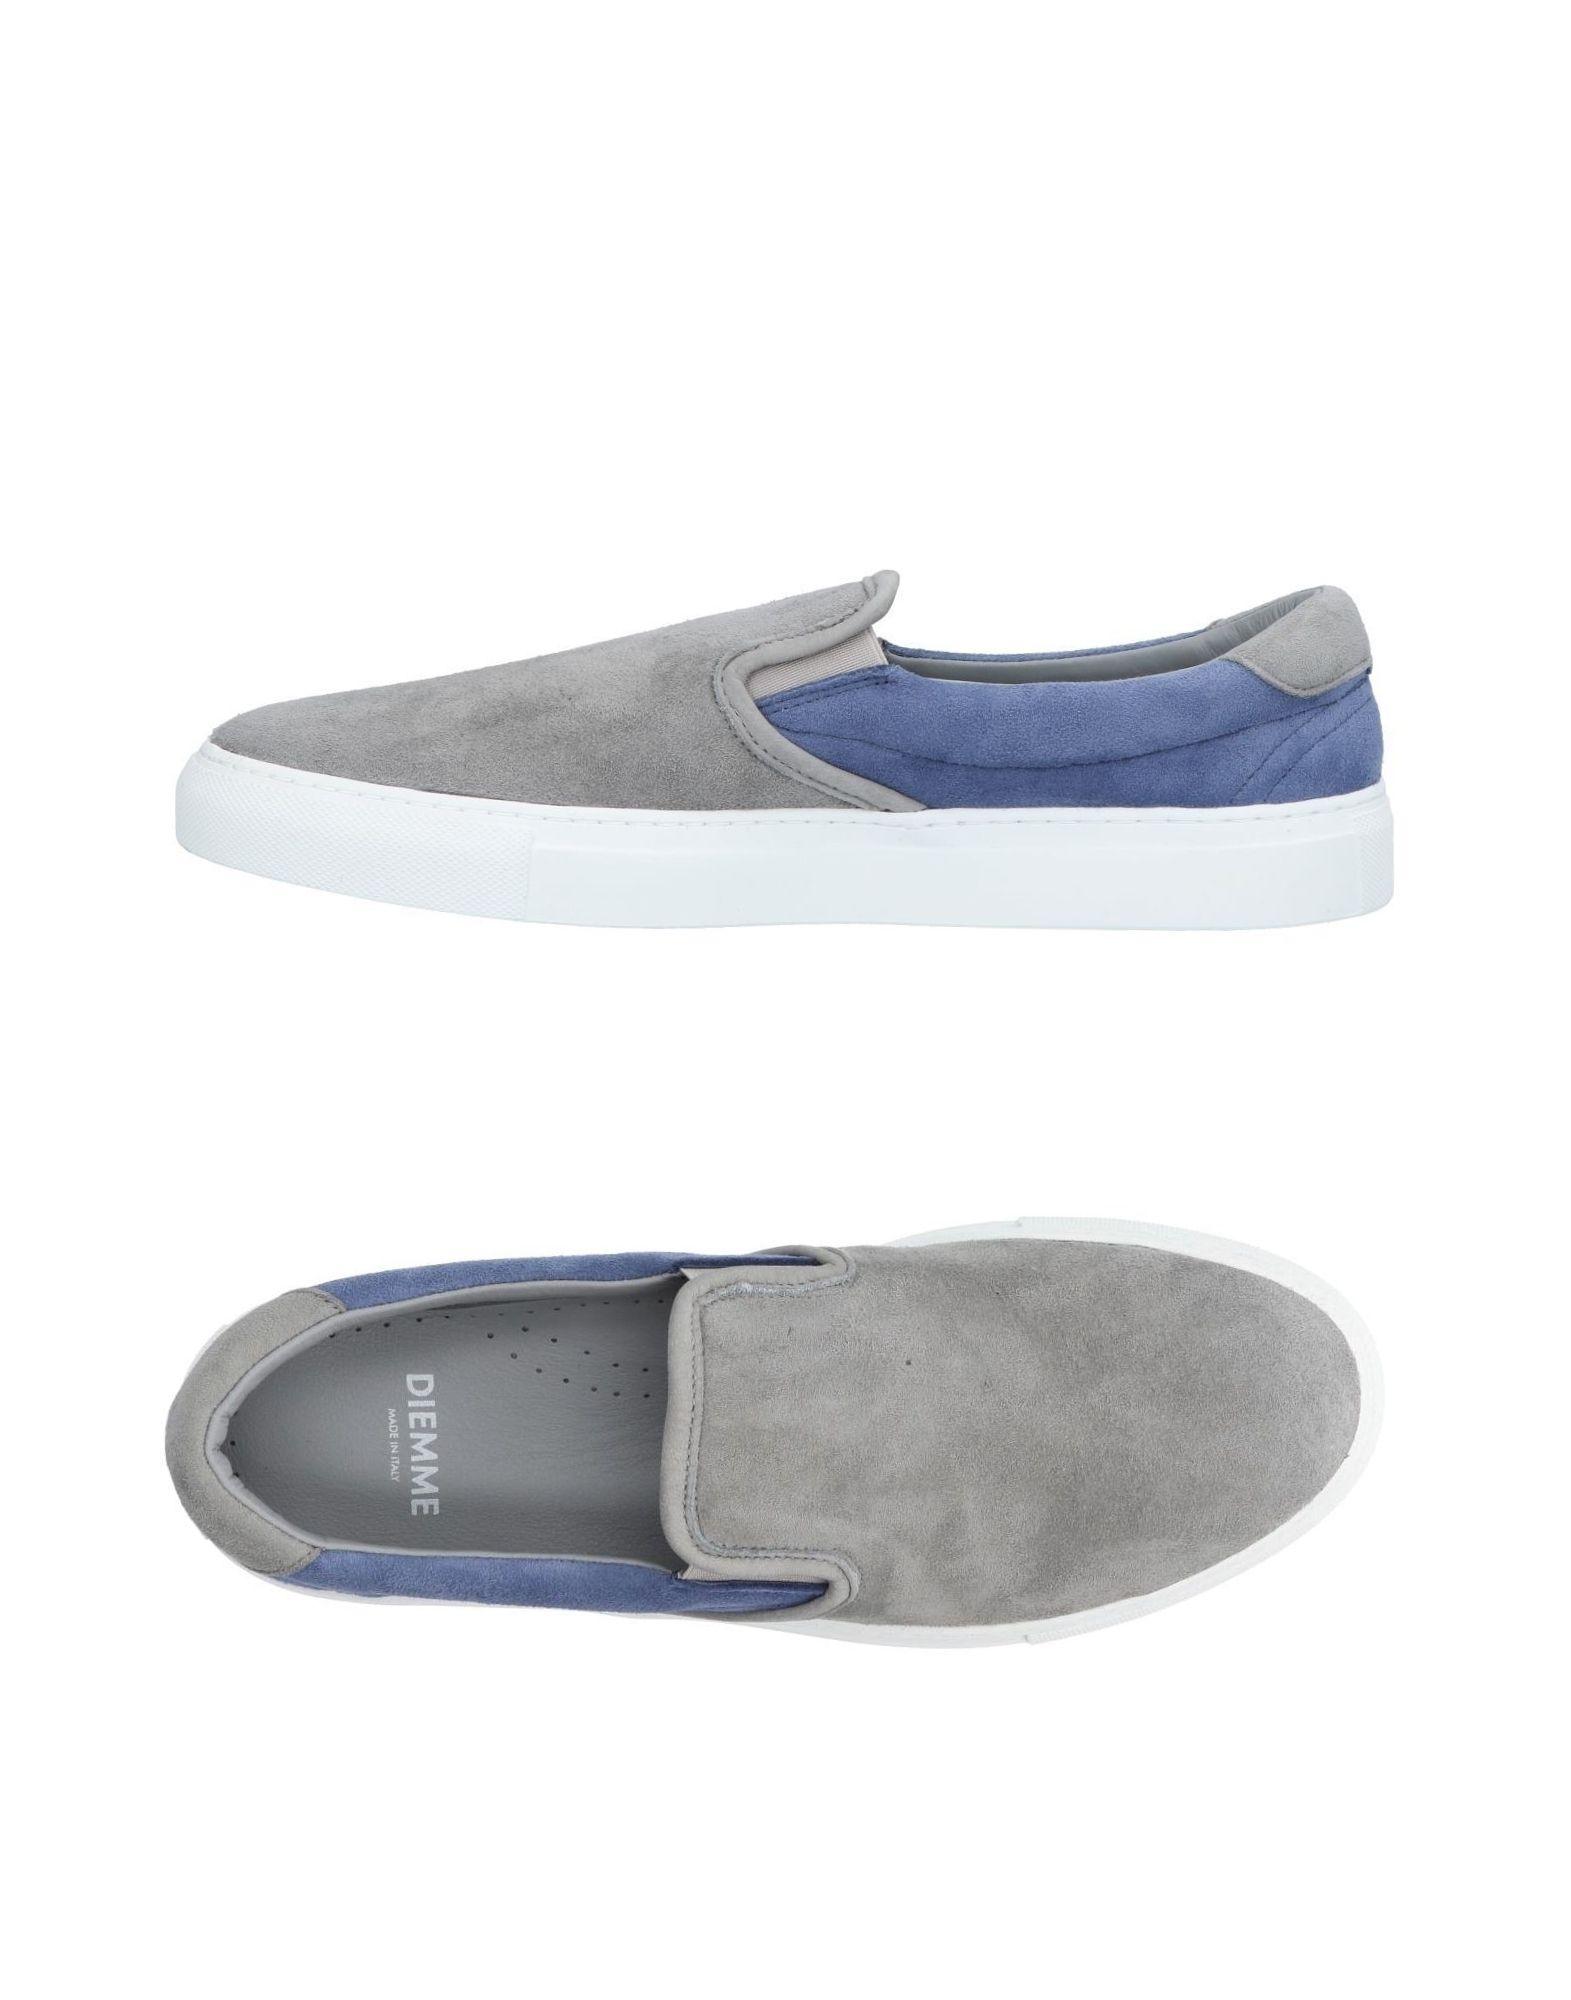 Sneakers Diemme Uomo - Acquista online su